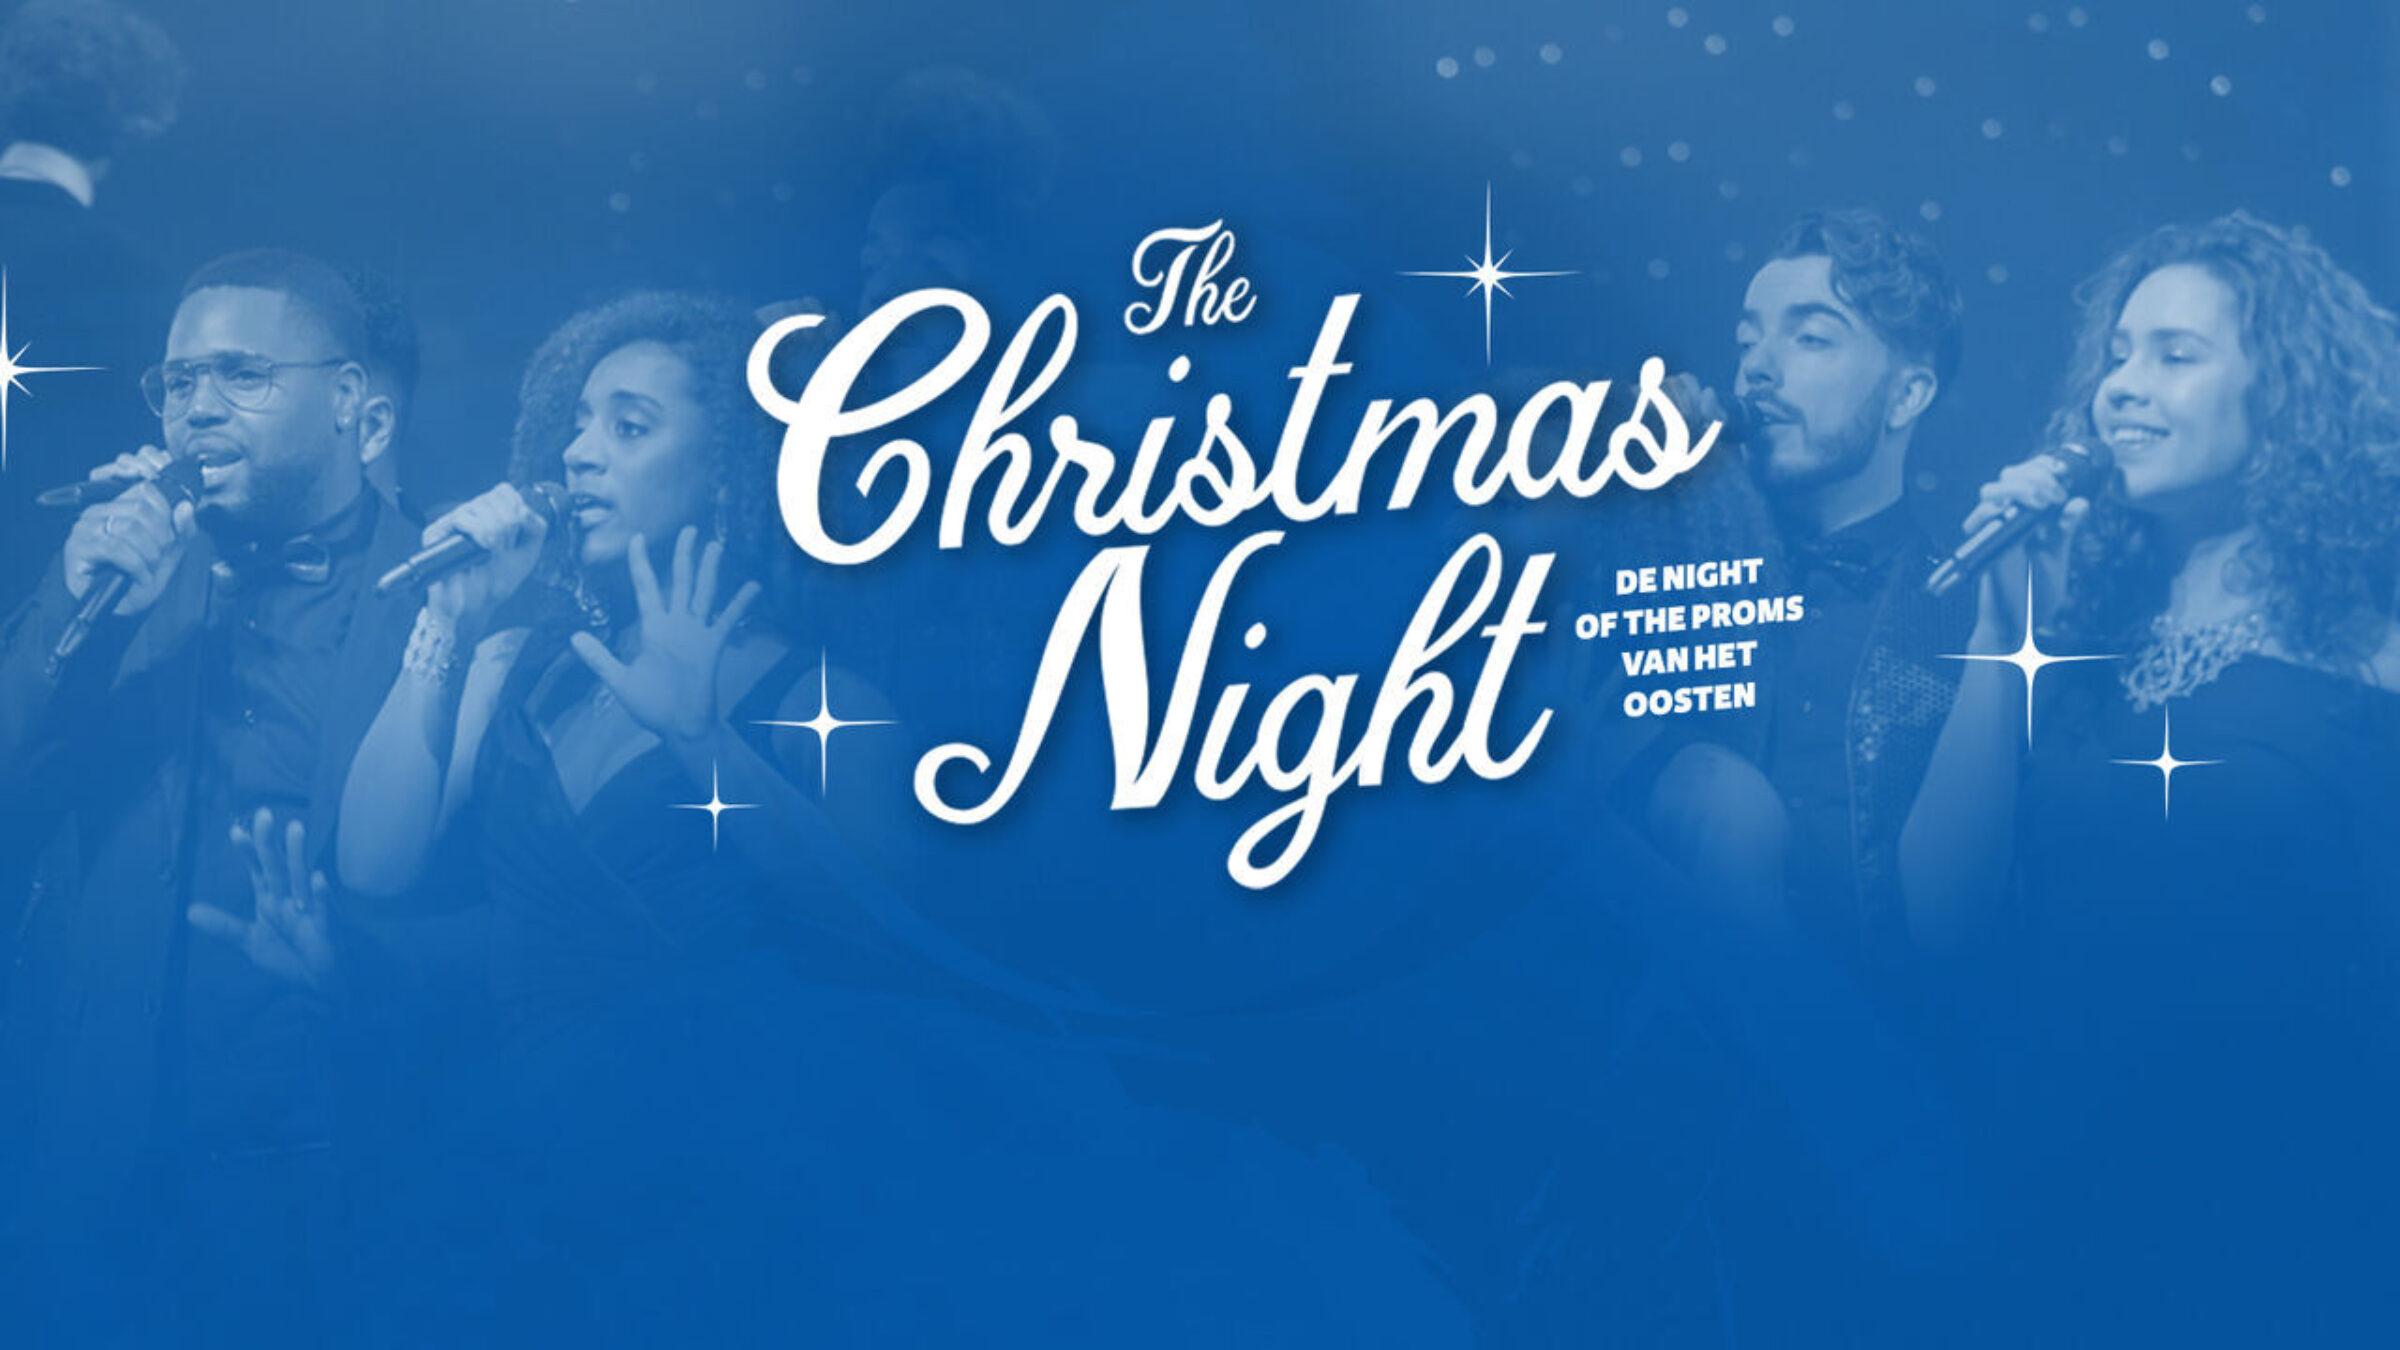 The Christmas Night